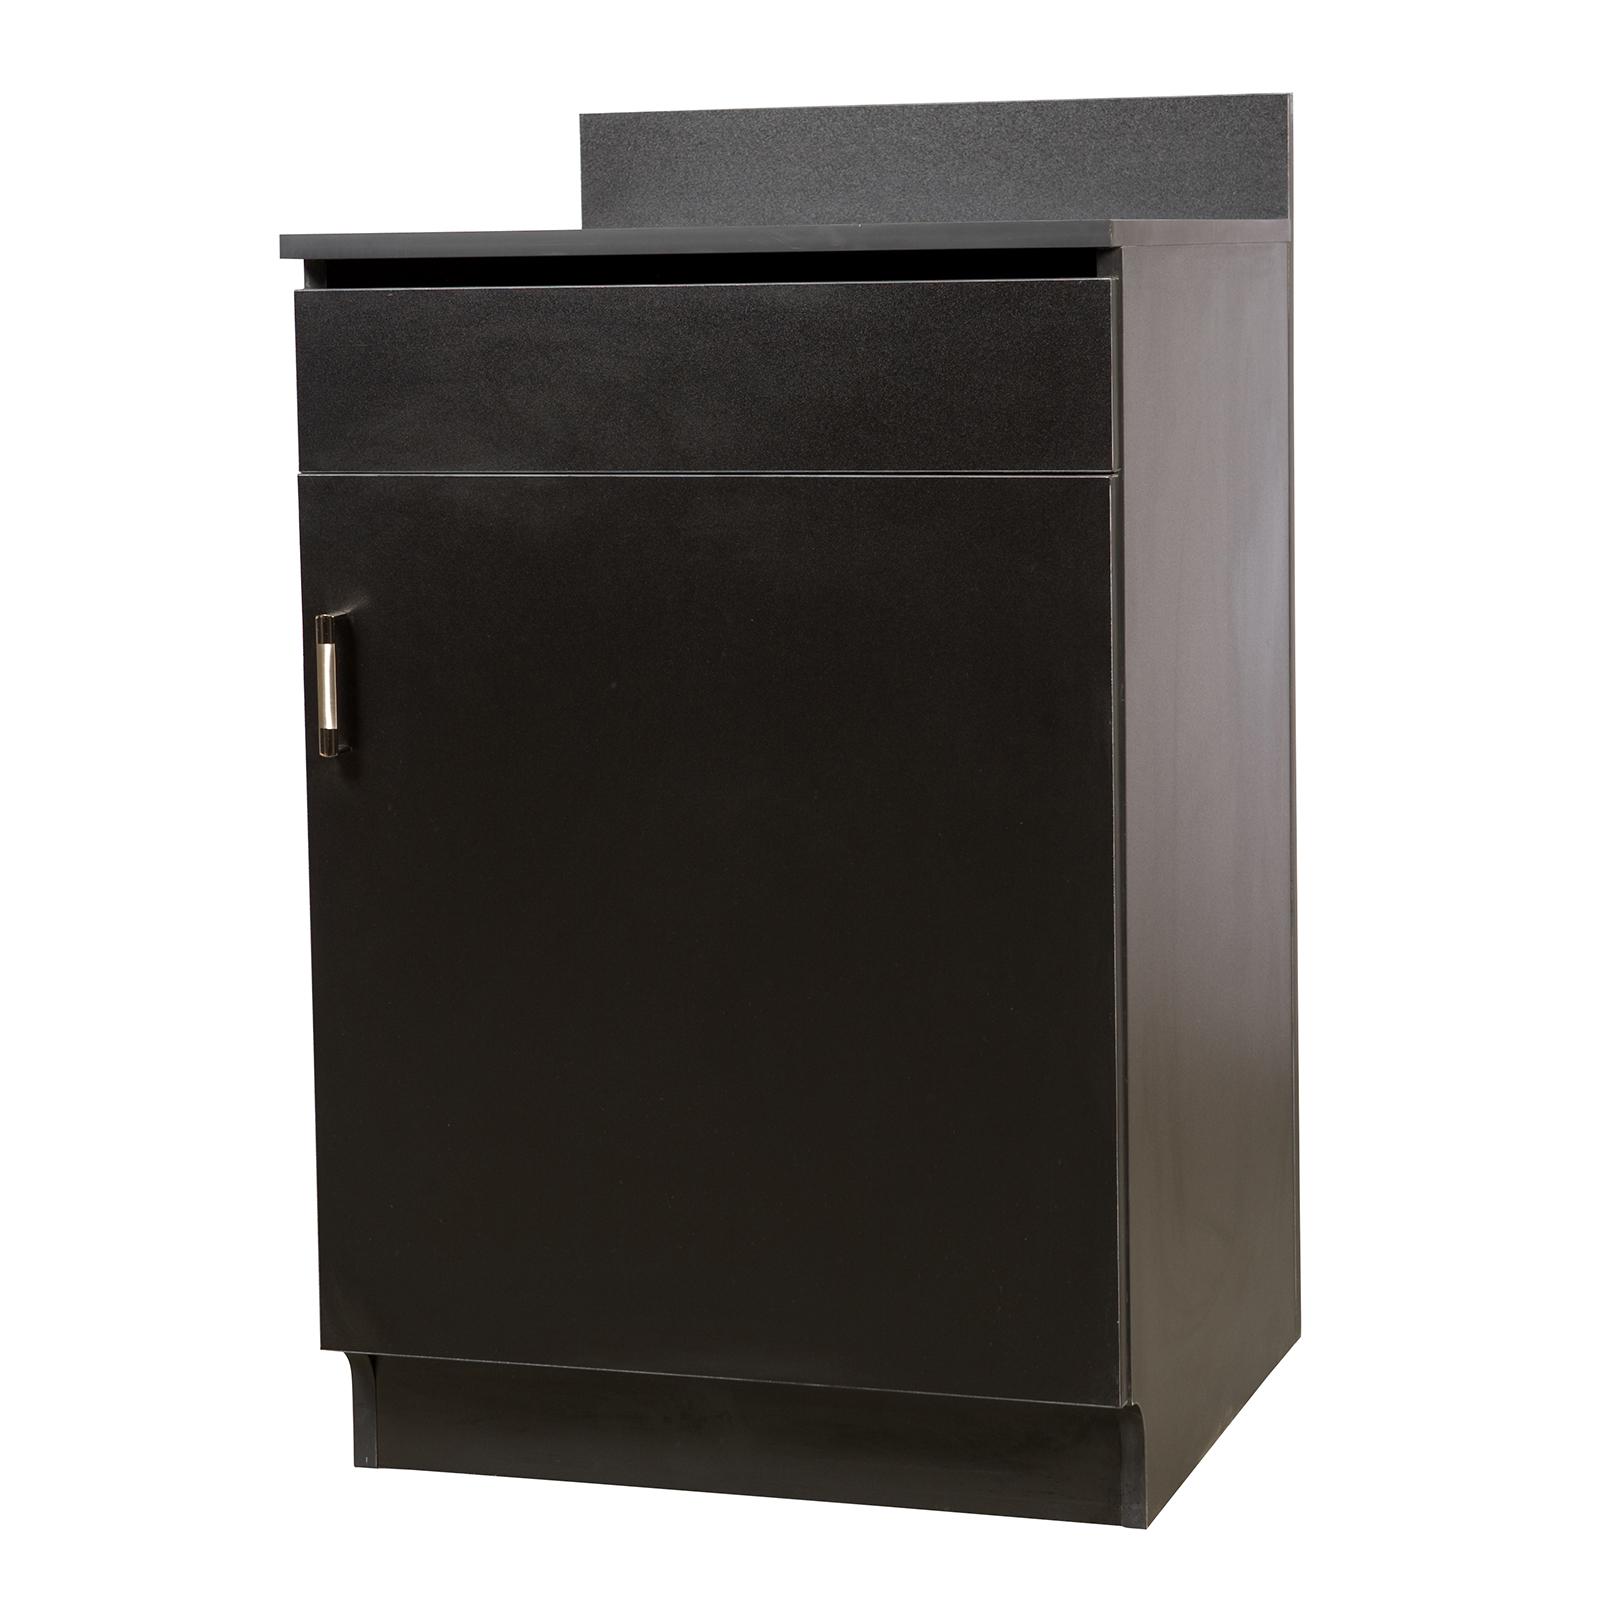 Oak Street M8210-BLK-UNASSEMBLED wait station cabinet